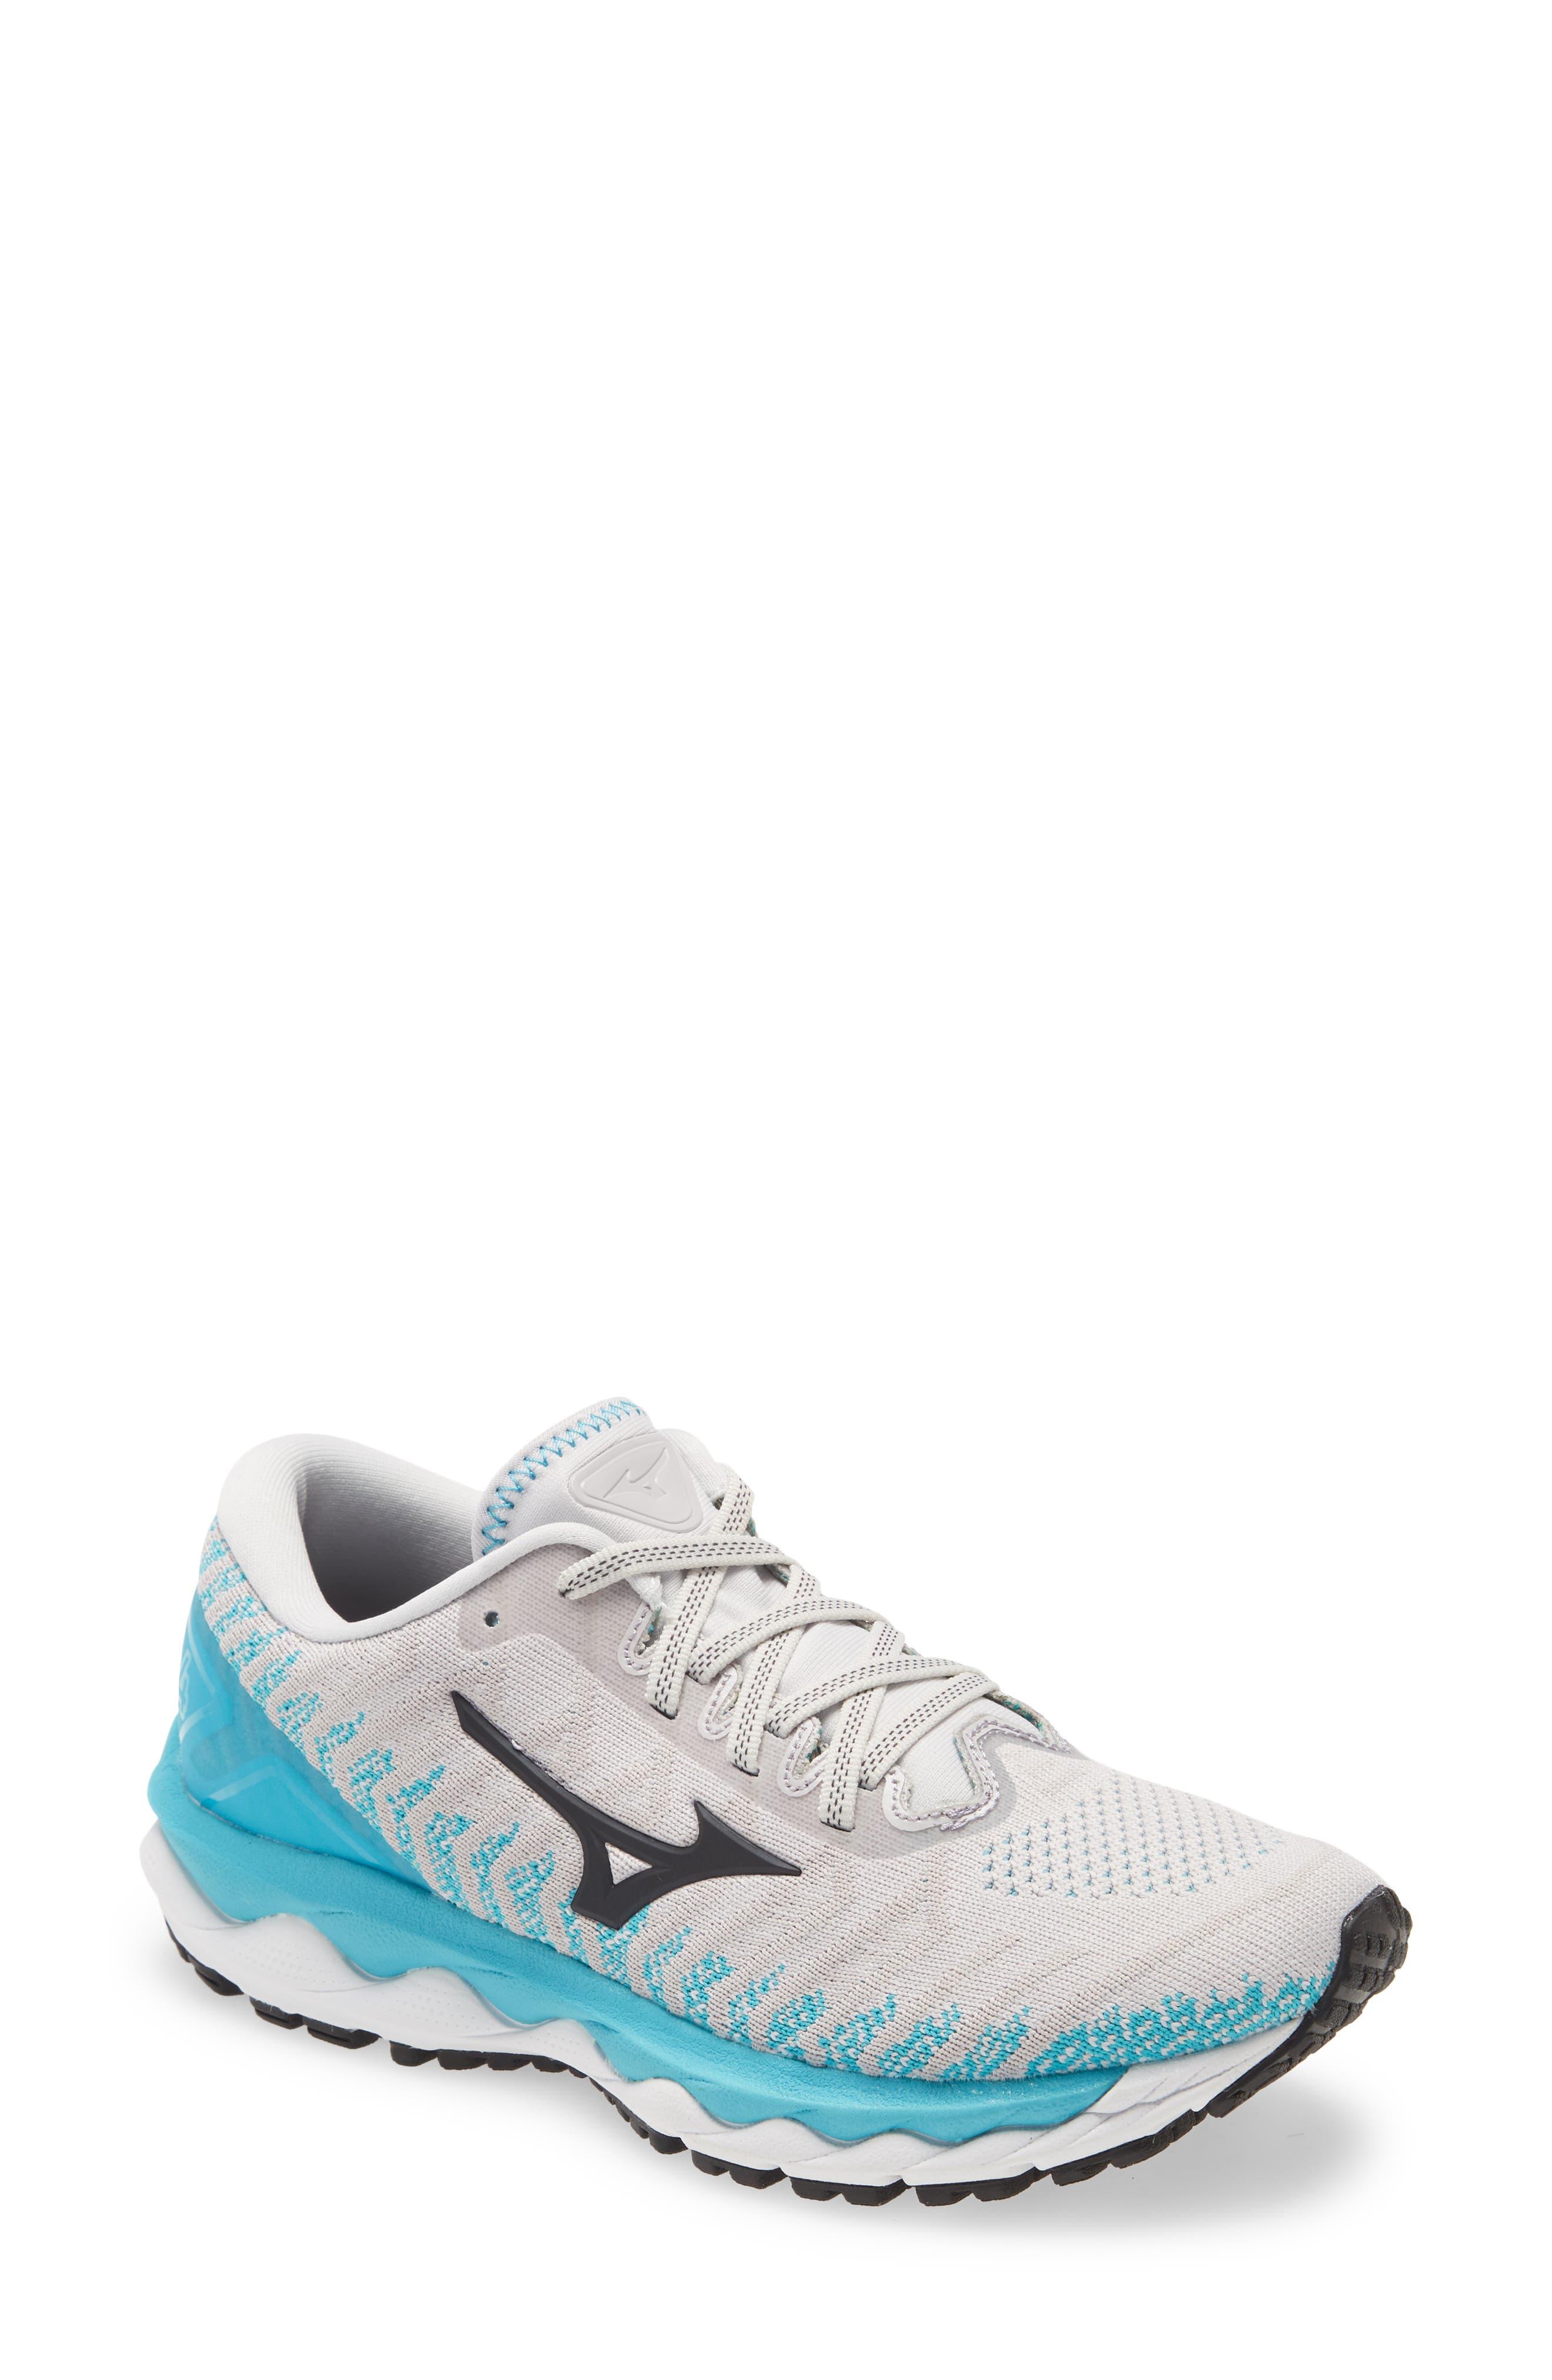 Wave Sky 4 Waveknit(TM) Running Shoe